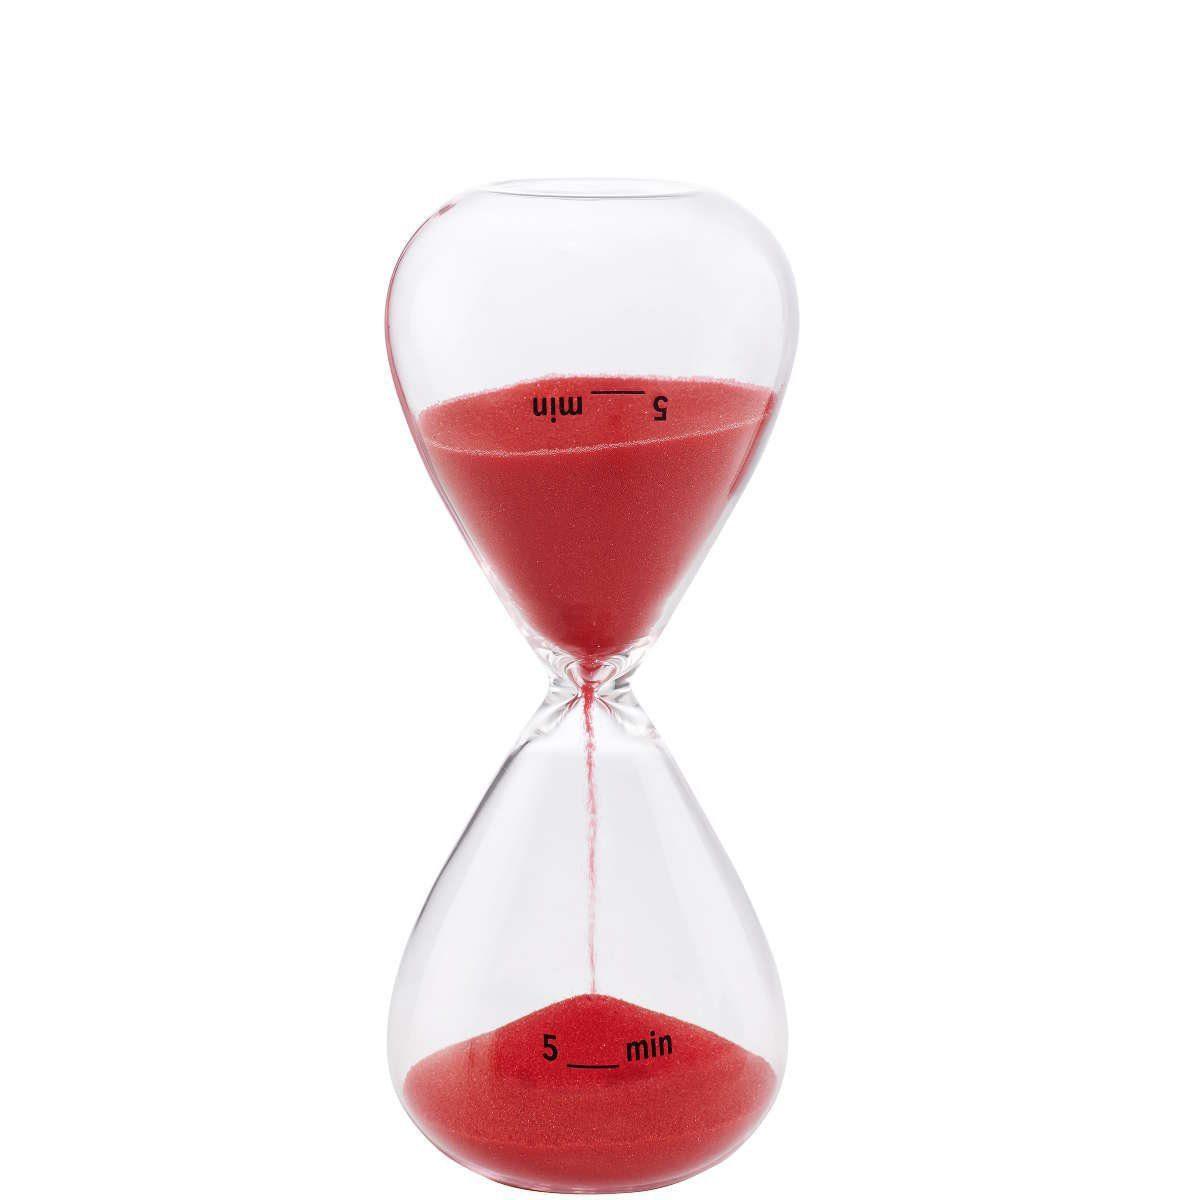 BUTLERS 5 MINUTES »Sanduhr 5 Minuten«